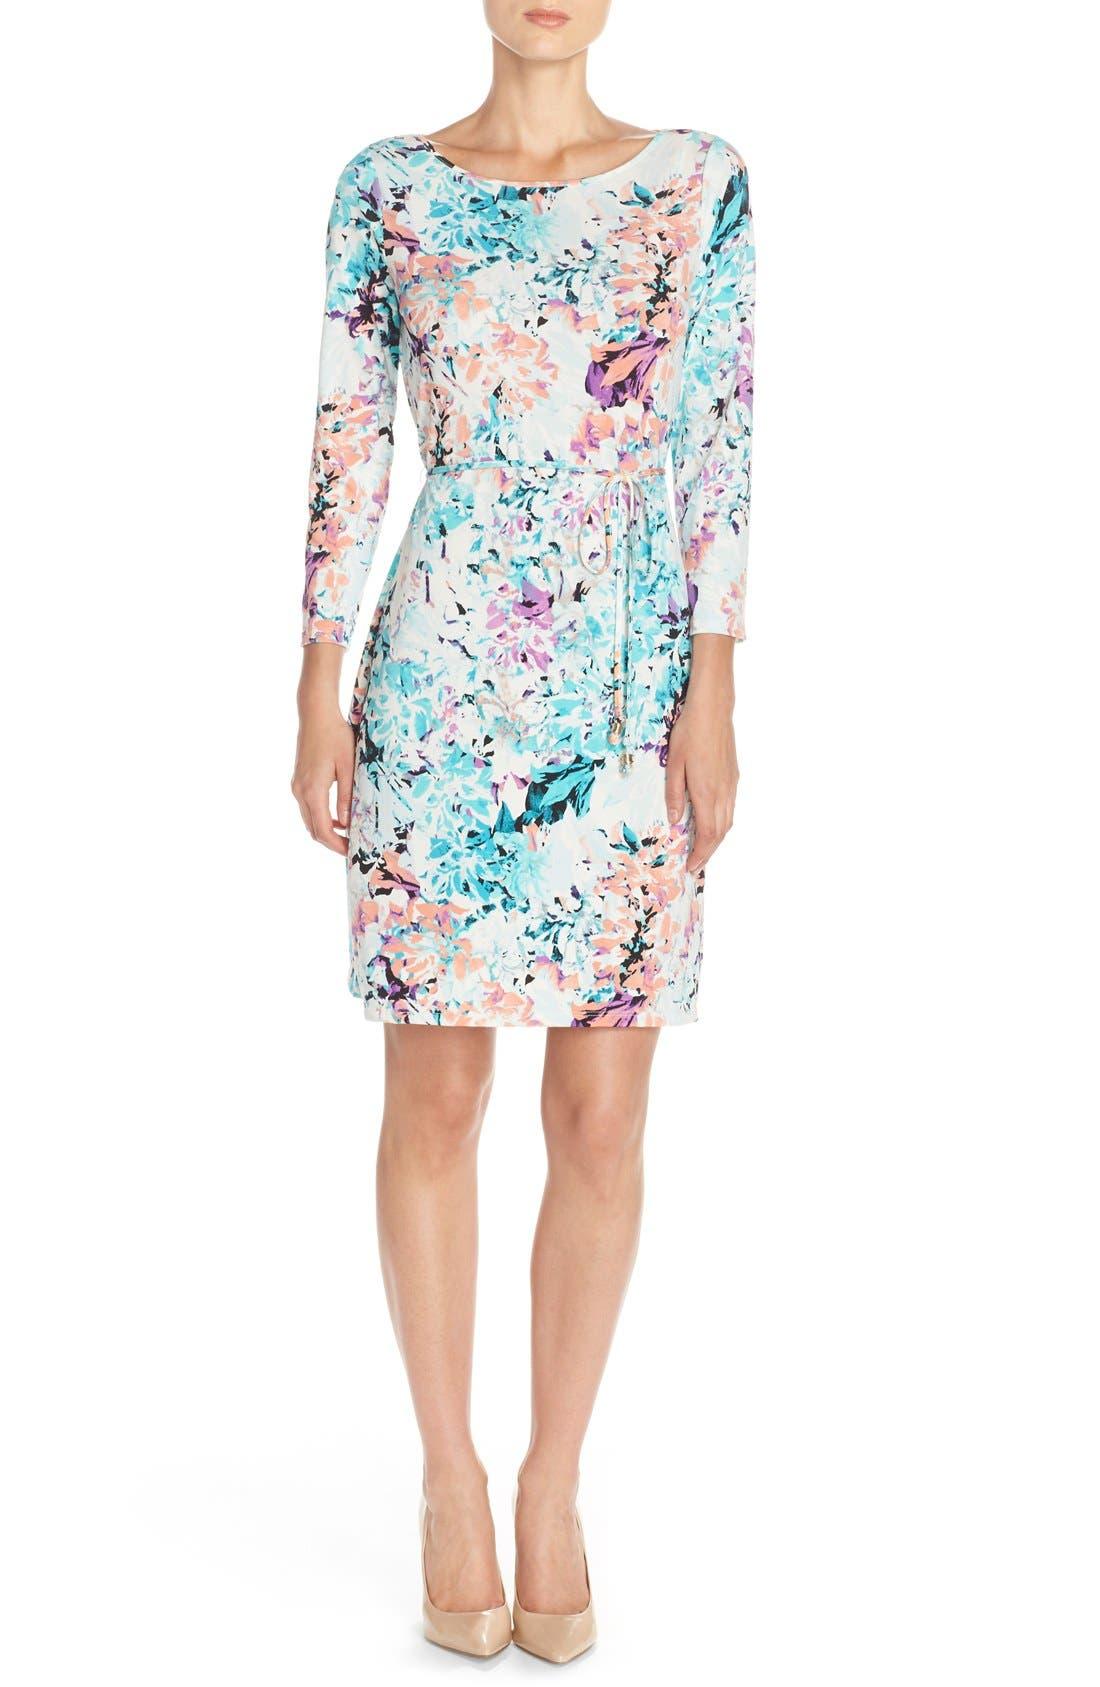 IVANKA TRUMP, Floral Print Jersey A-Line Dress, Alternate thumbnail 4, color, 101